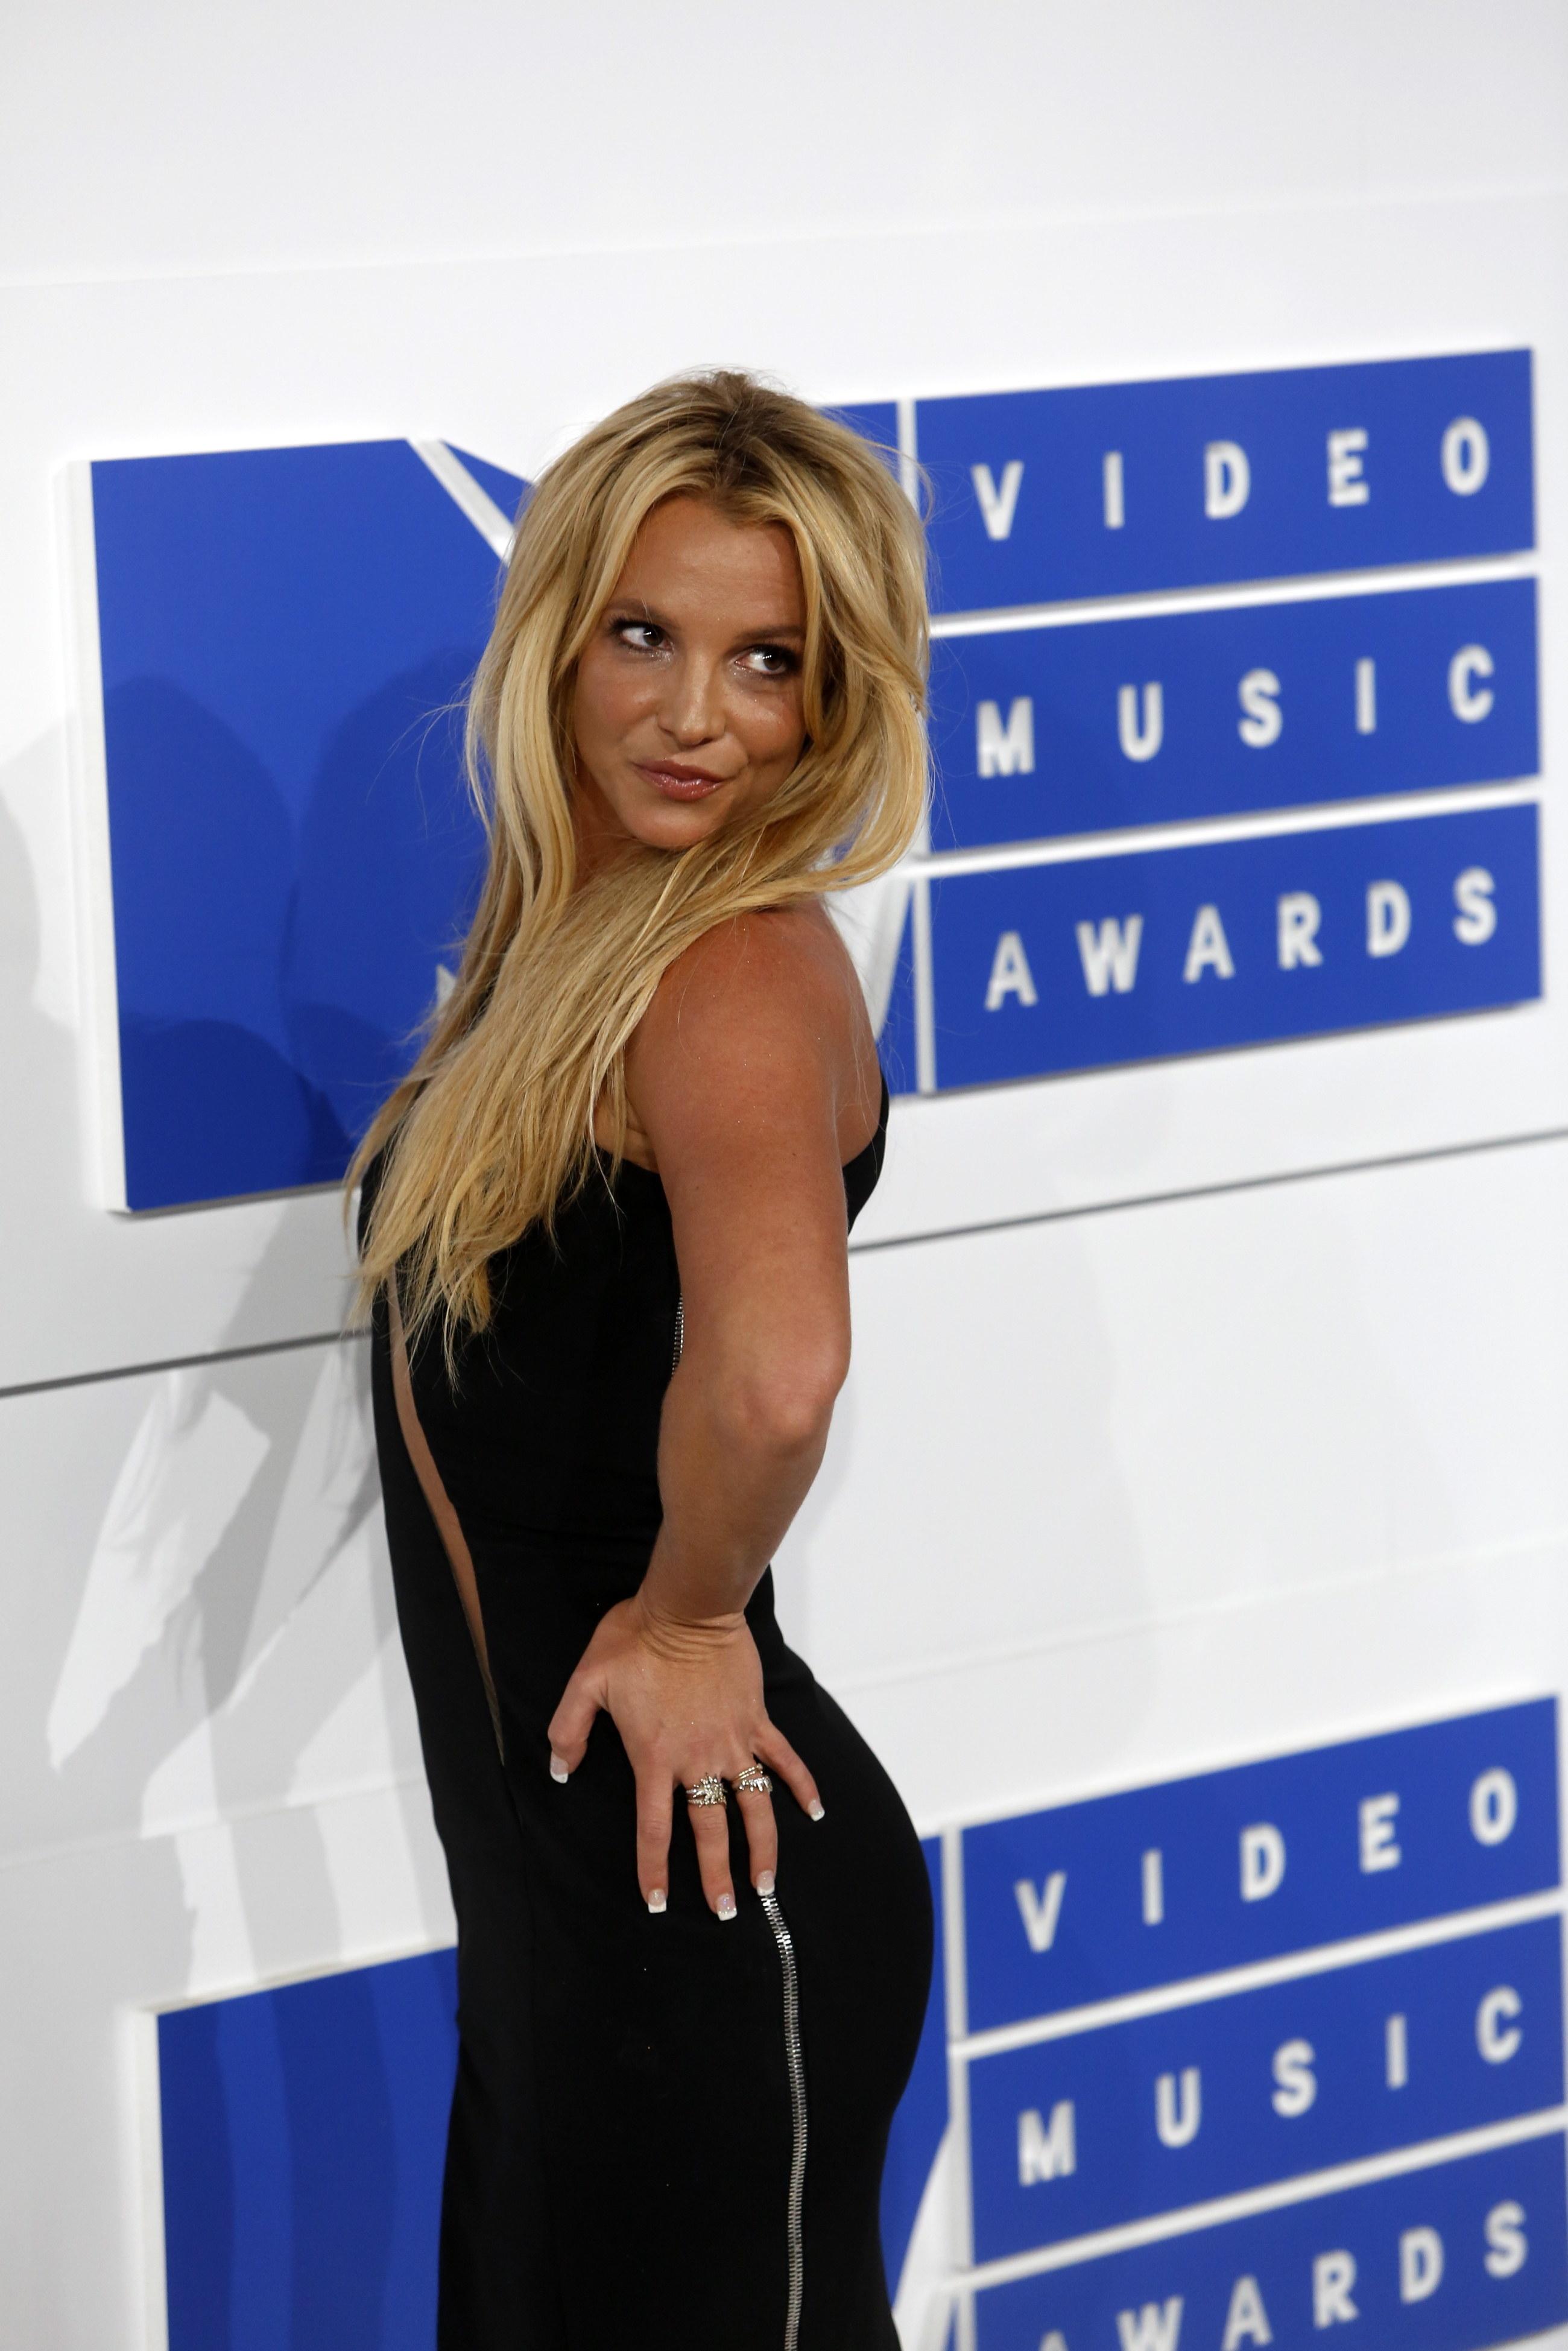 Britney Spears posing at the MTV VMAs